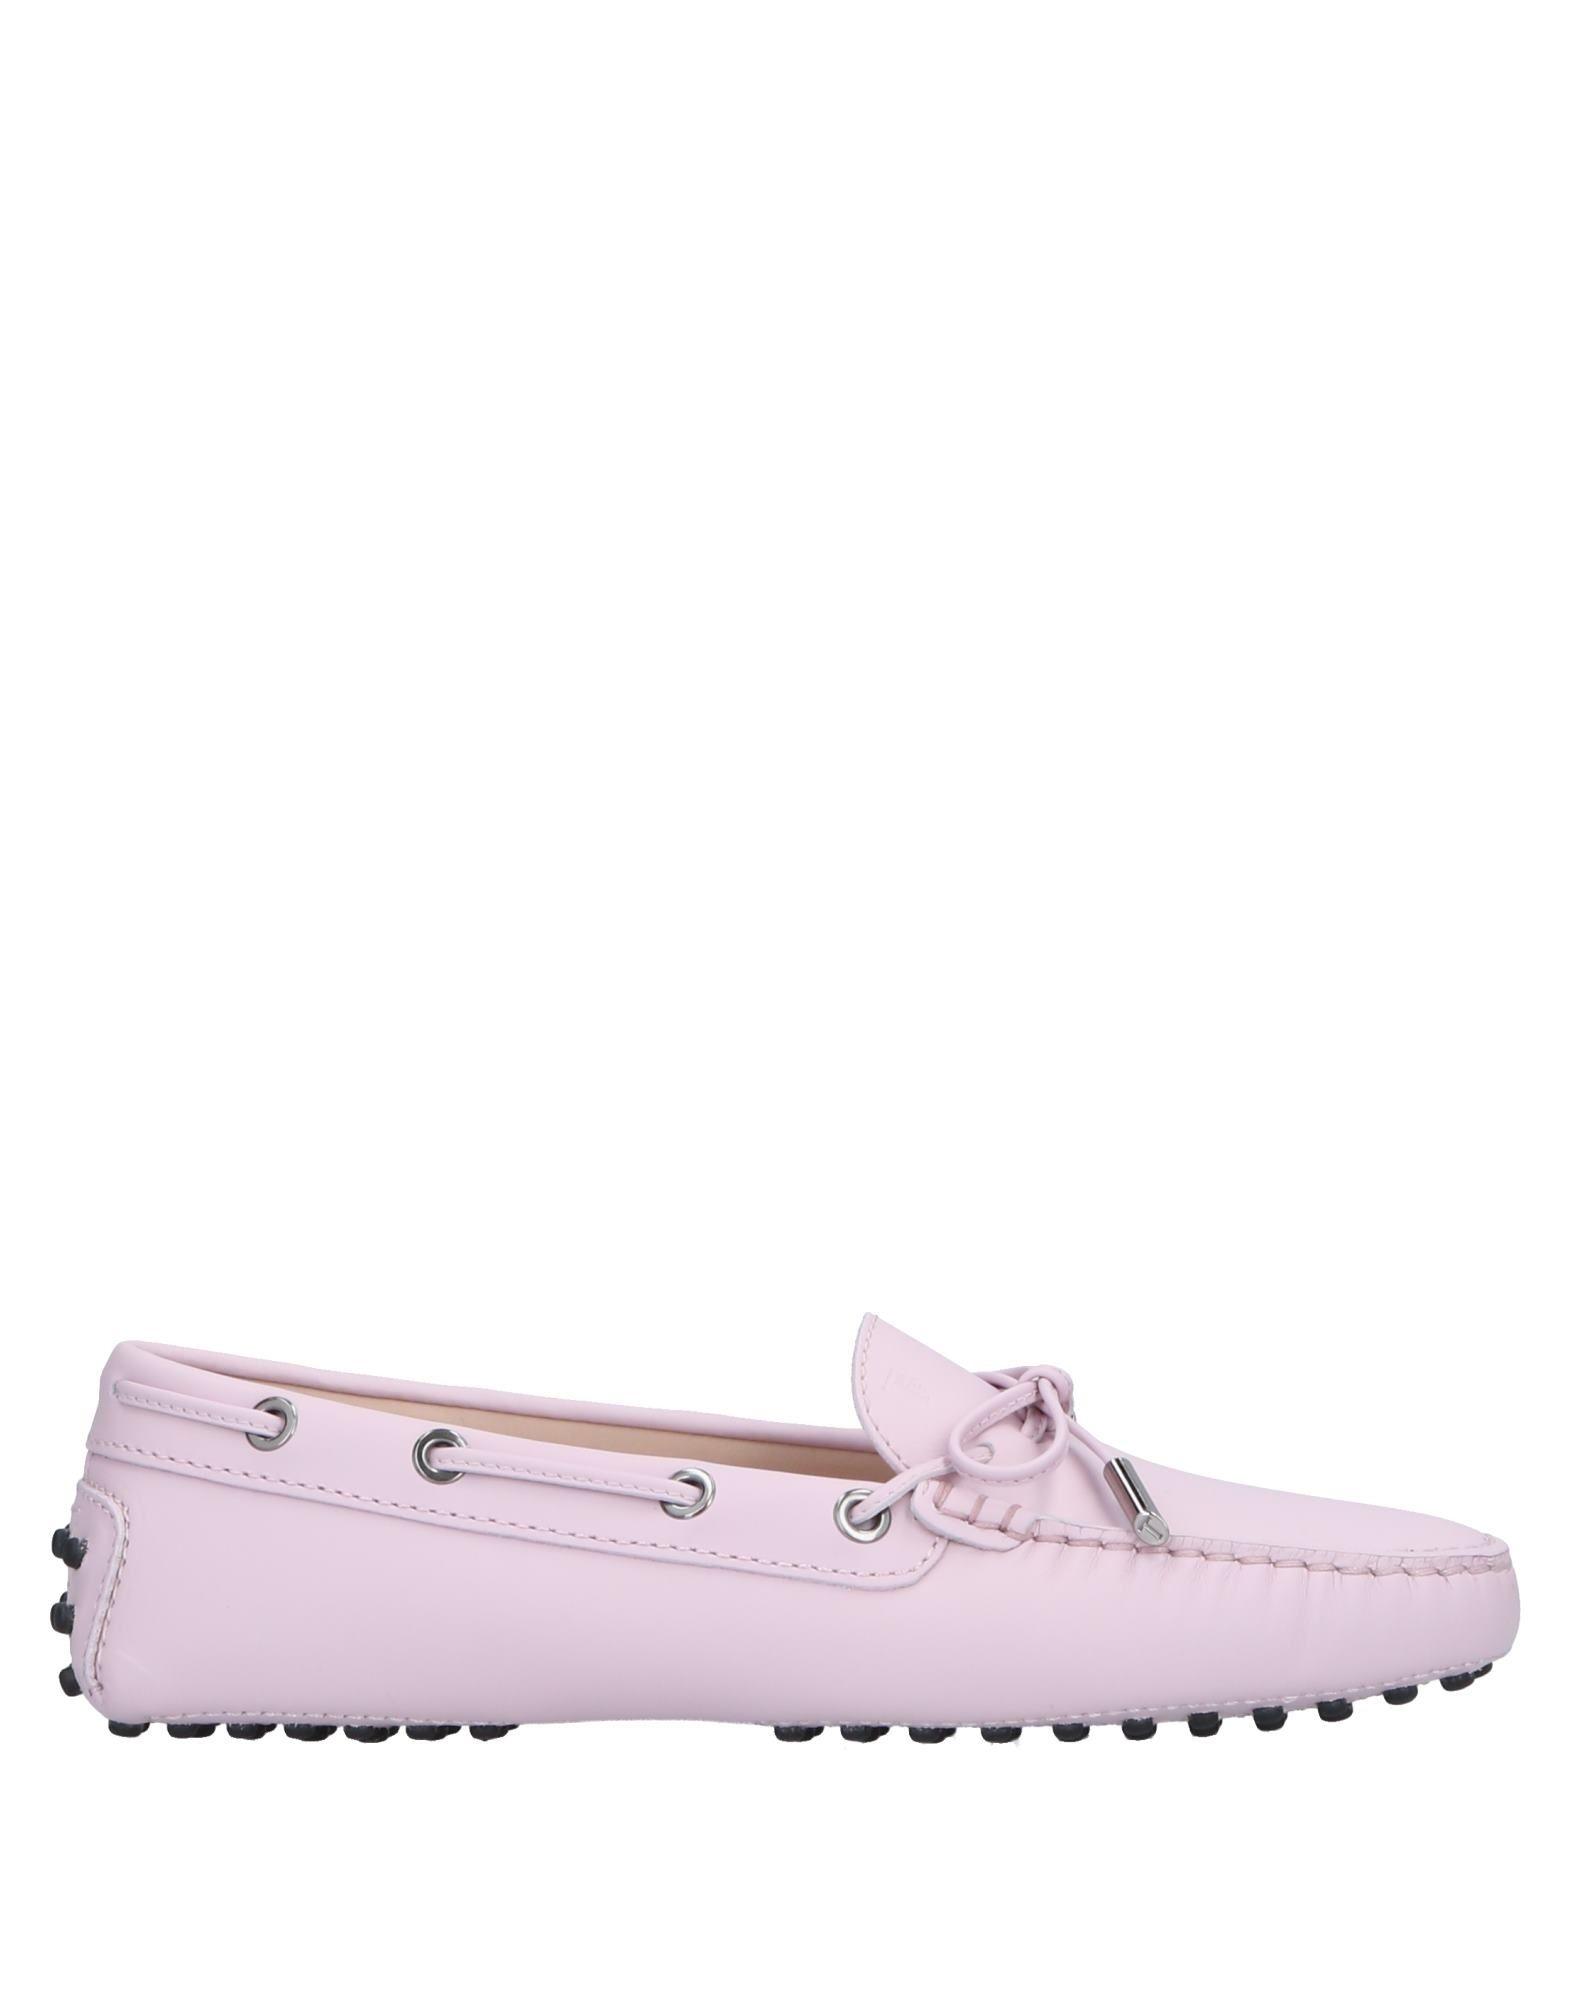 Rabatt Schuhe Tod's Mokassins Damen  11117500UF